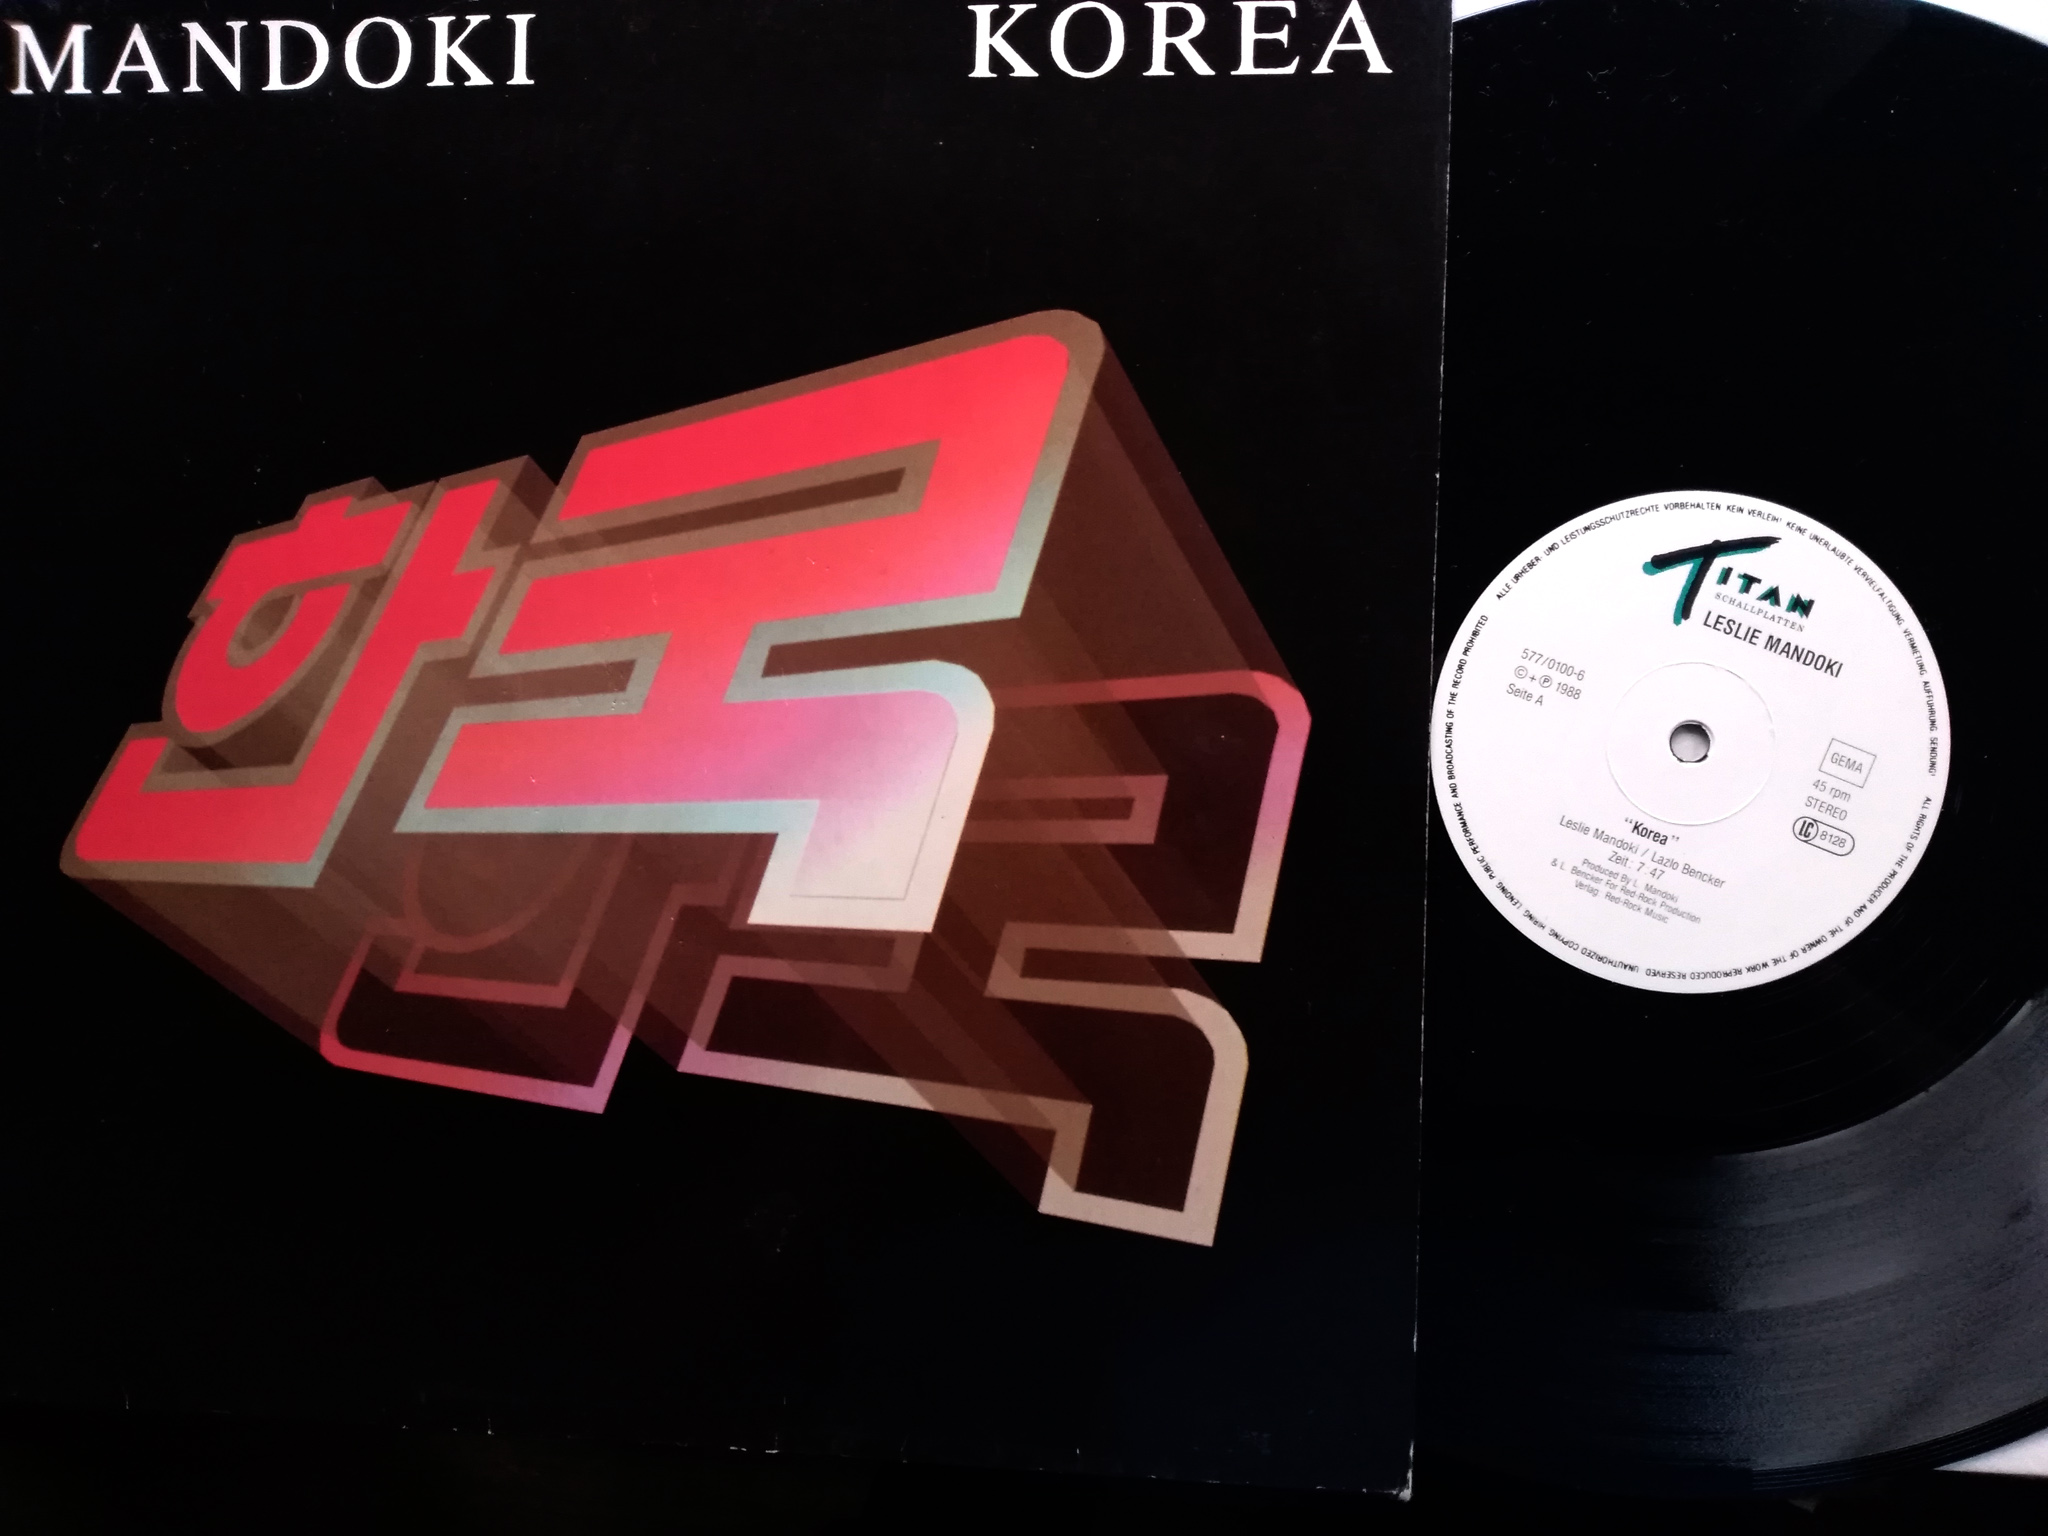 Mandoki - Korea